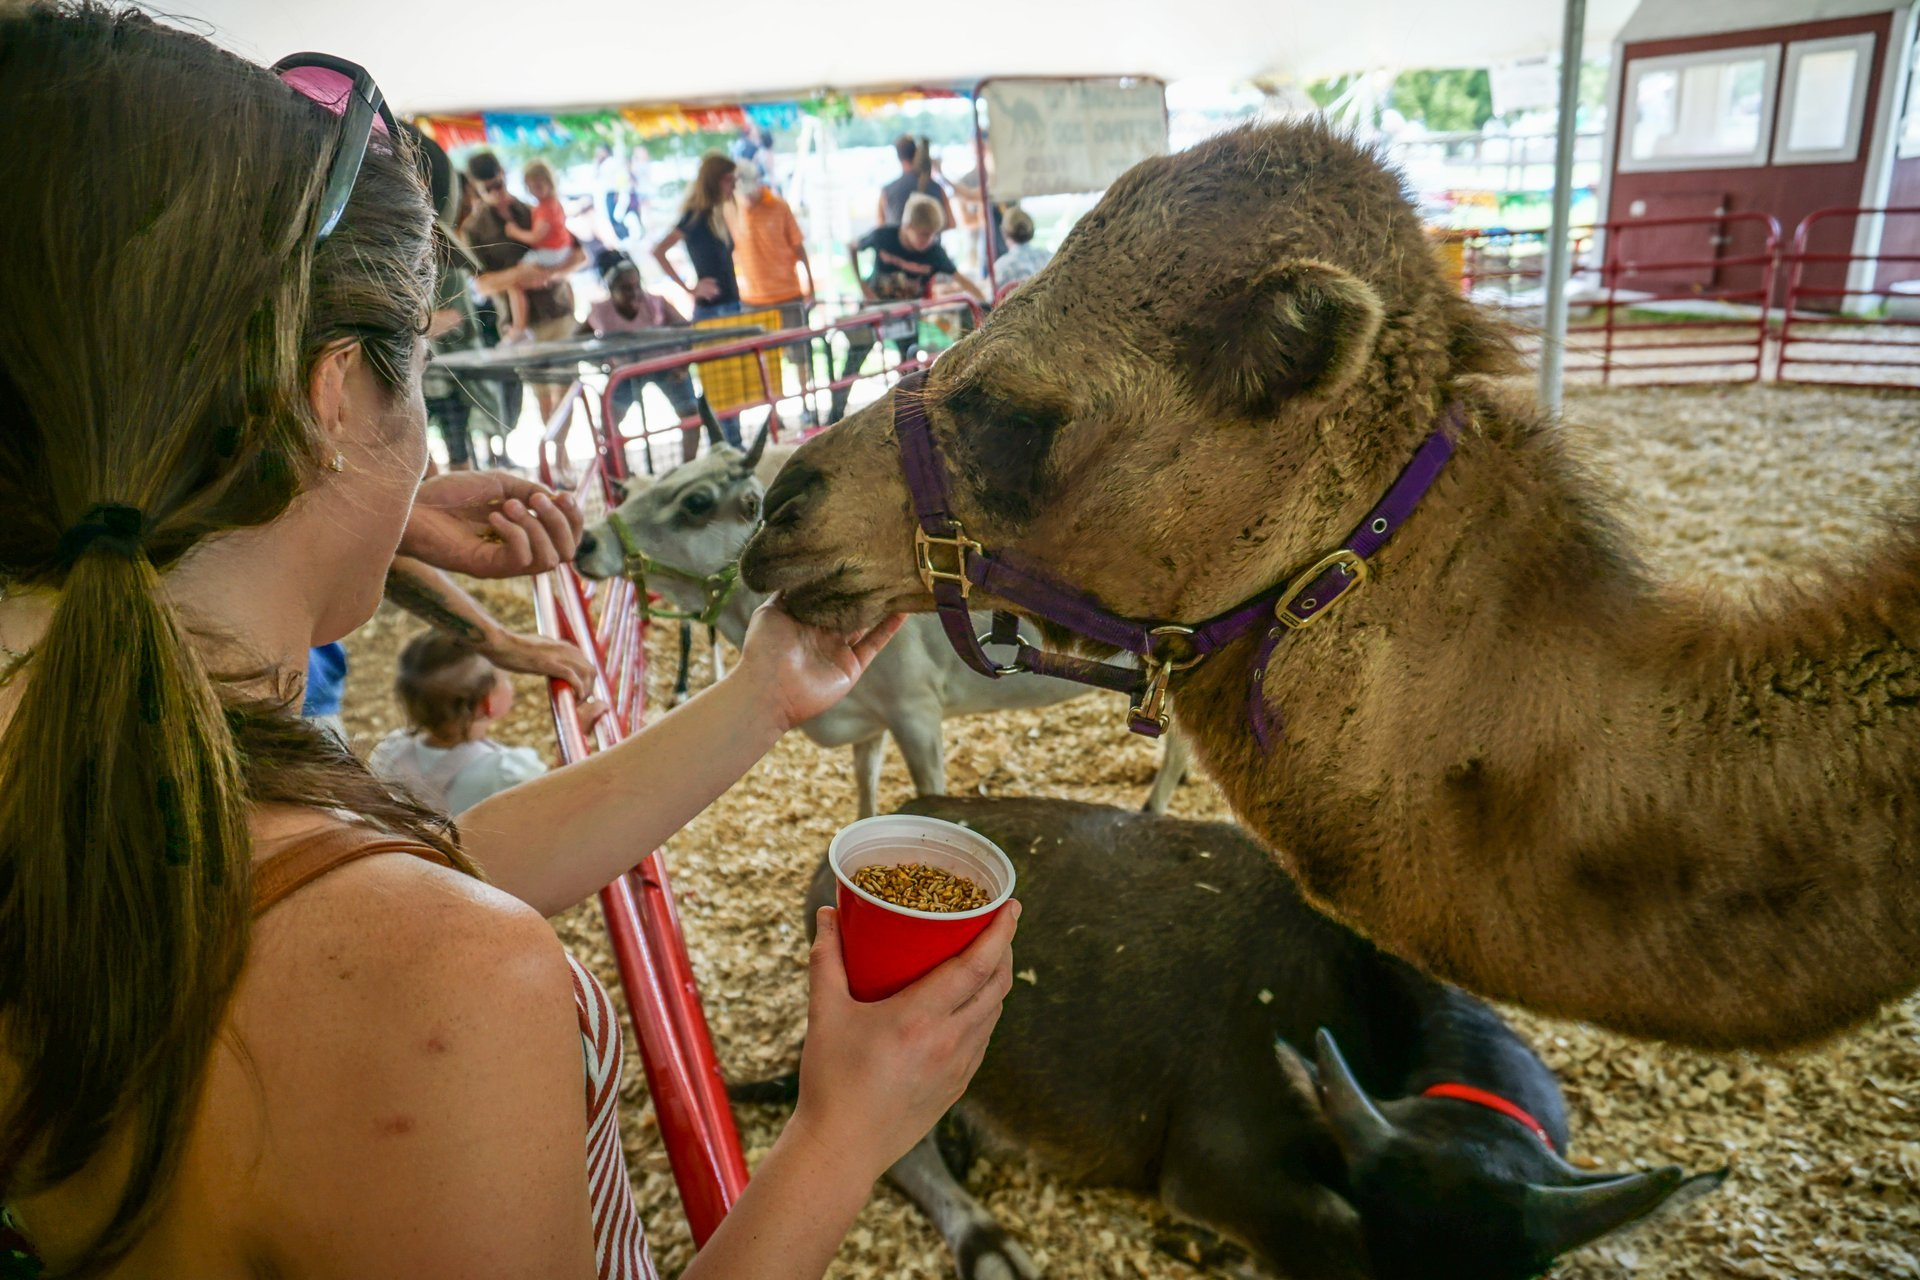 Georgia State Fair in Georgia - Best Season 2020